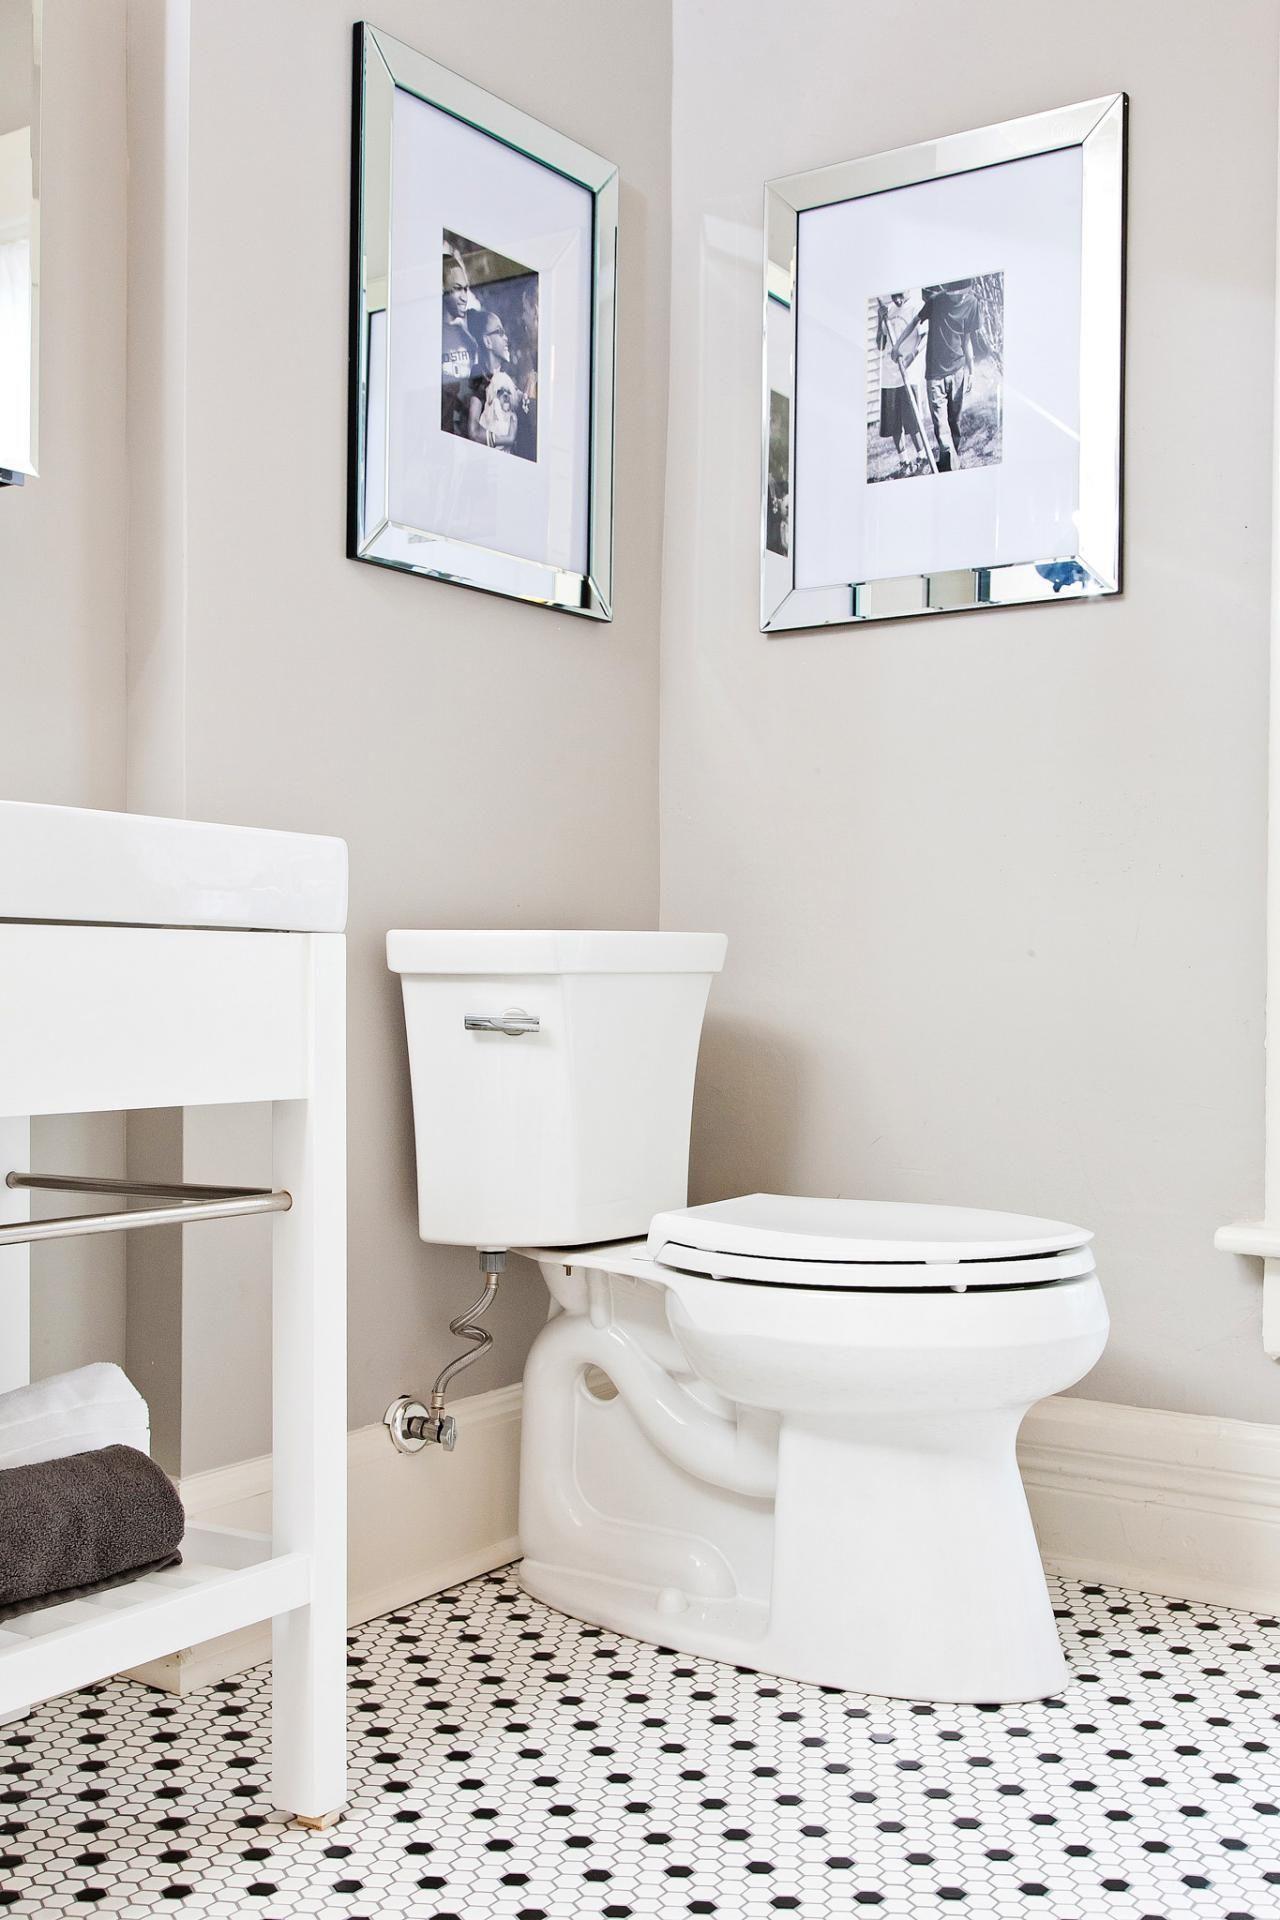 Photos Rehab Addict Hgtv Rehab Addict Bathroom Black And White Bathroom Floor Bathroom Rehab